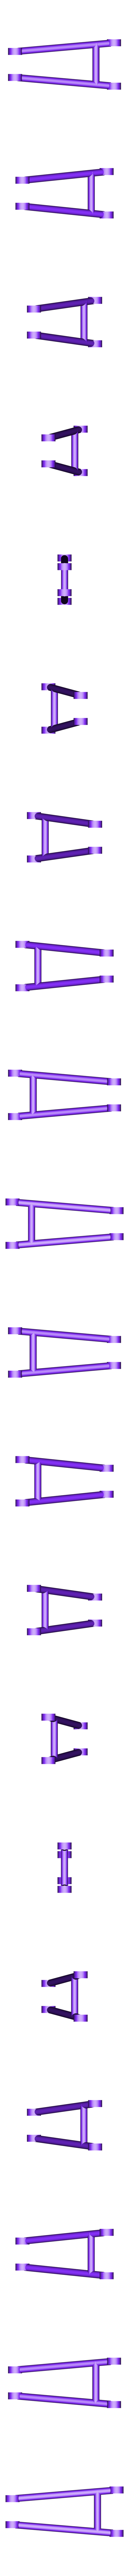 vork-armonder.stl Download free STL file trick (custom) • 3D printer model, jasperbaudoin